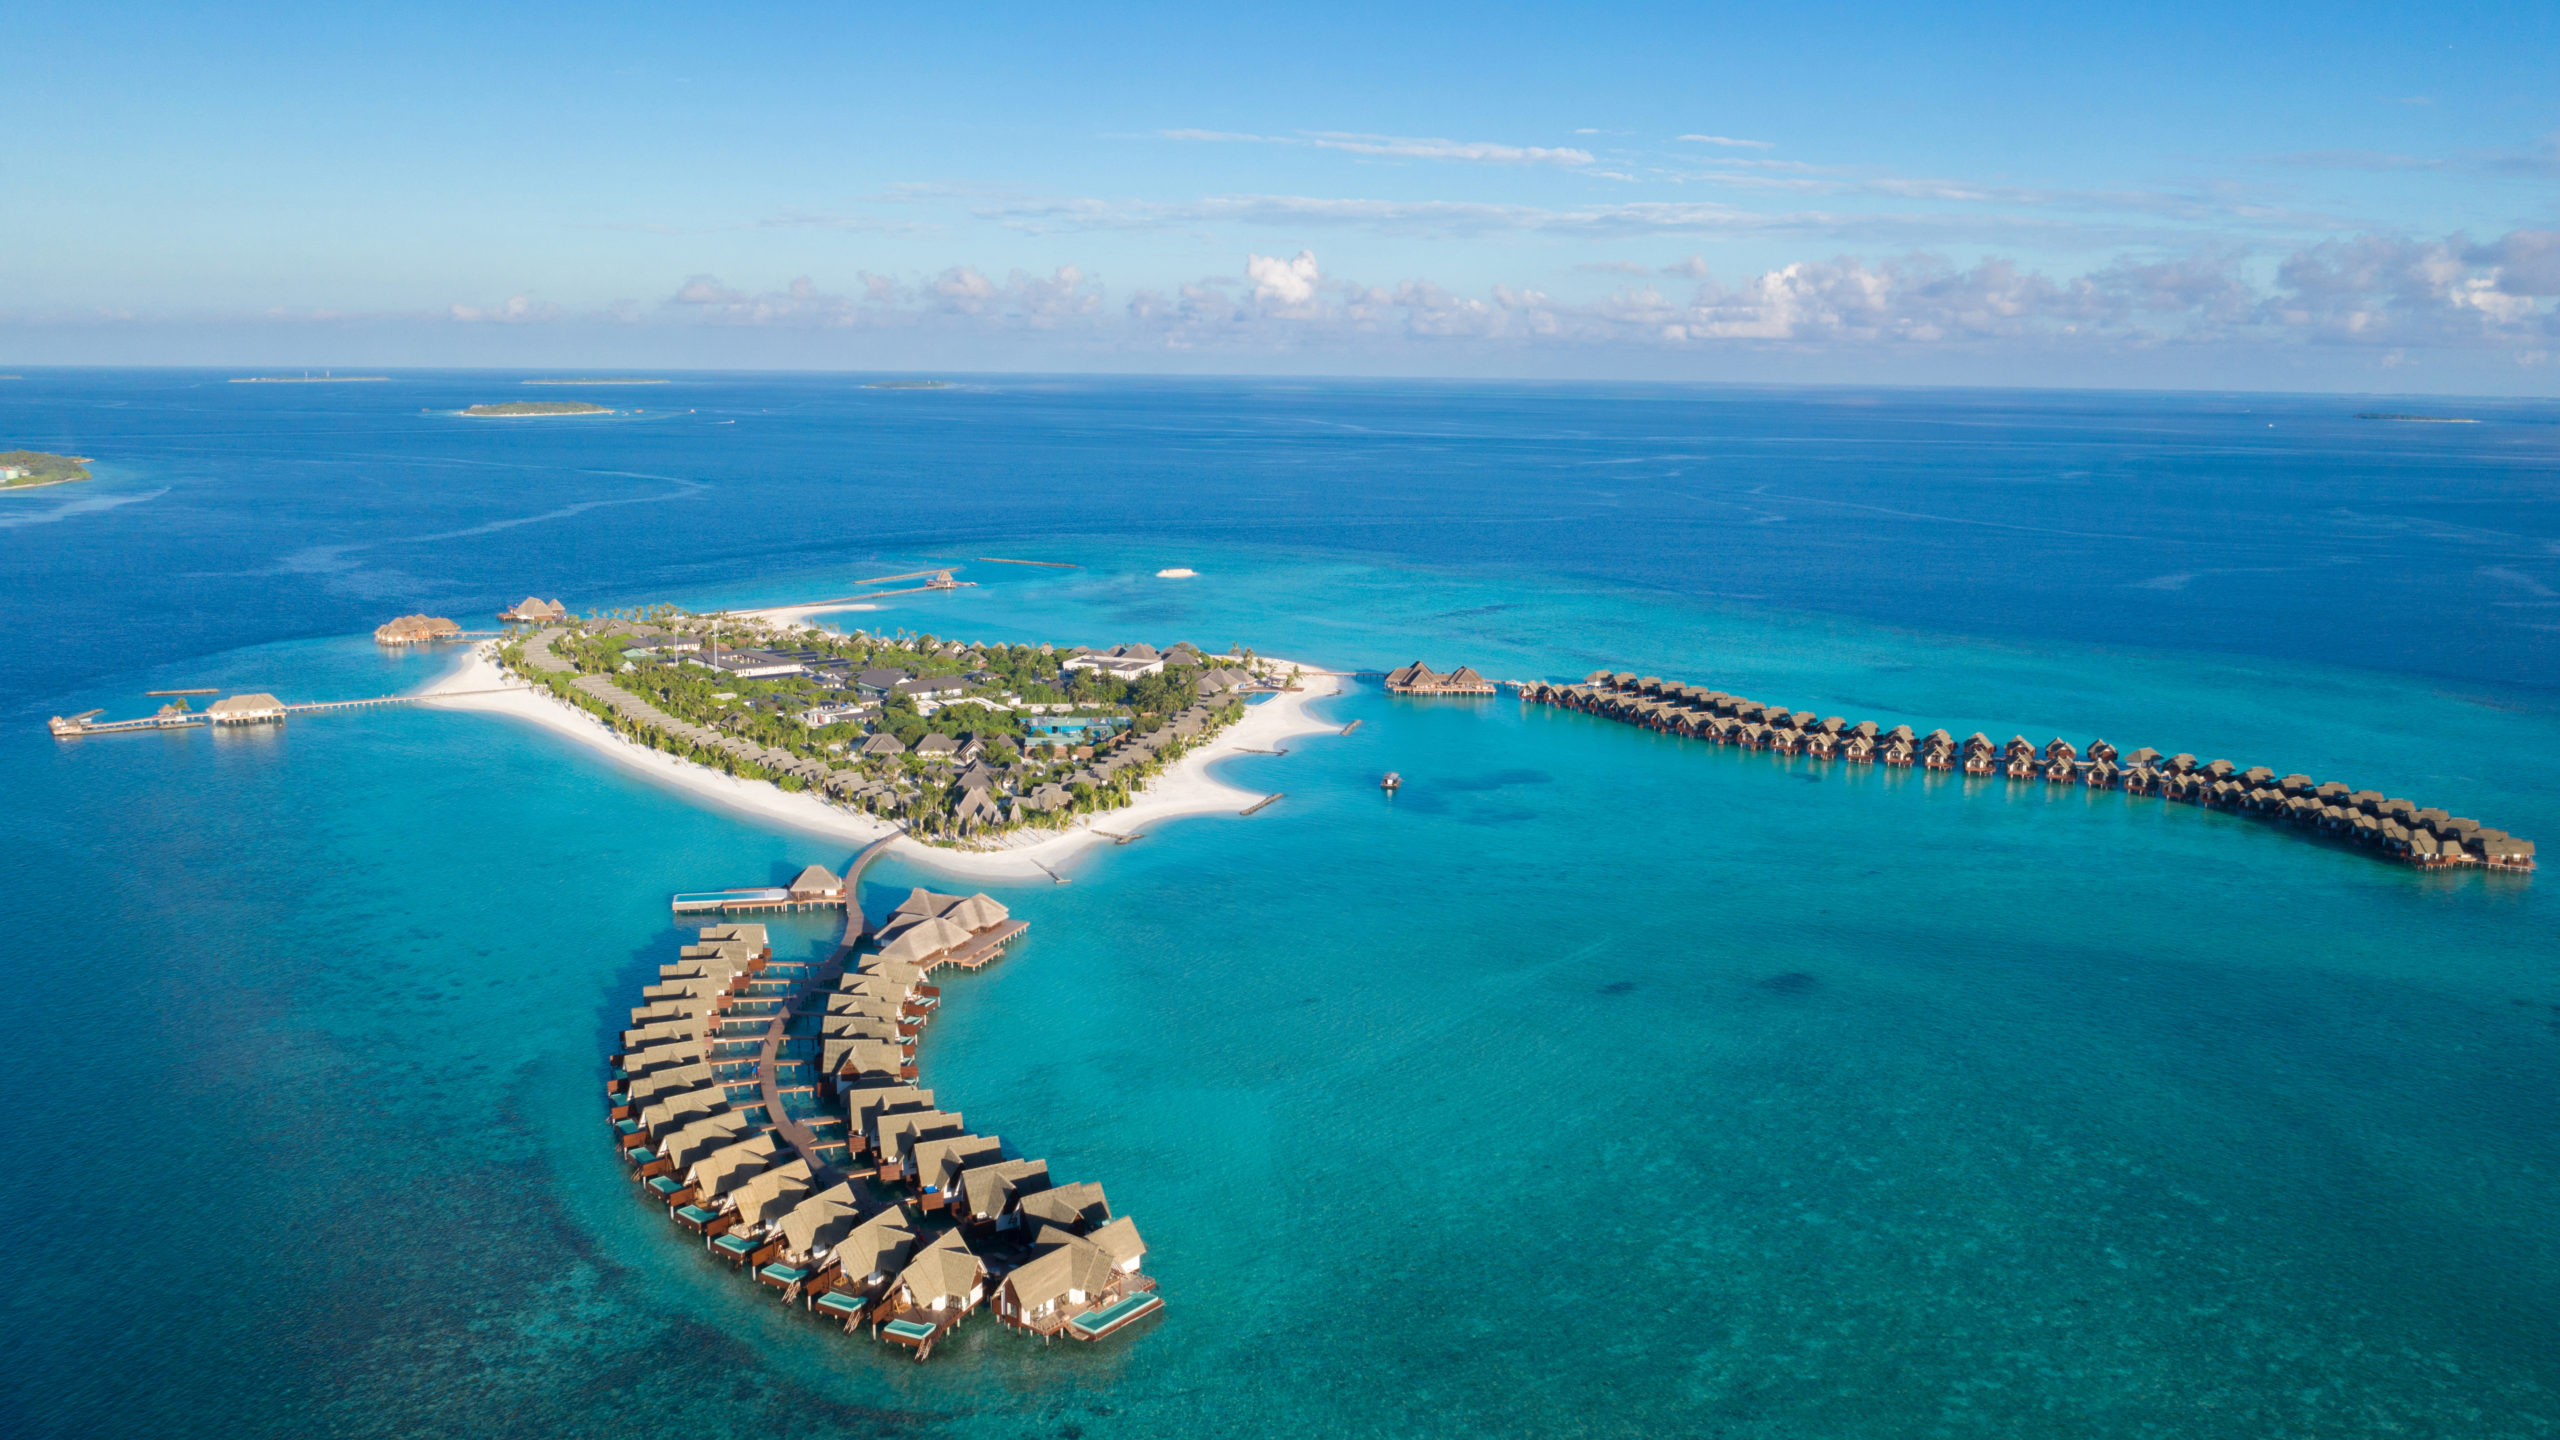 Honeymoon Destination: The Maldives Edition